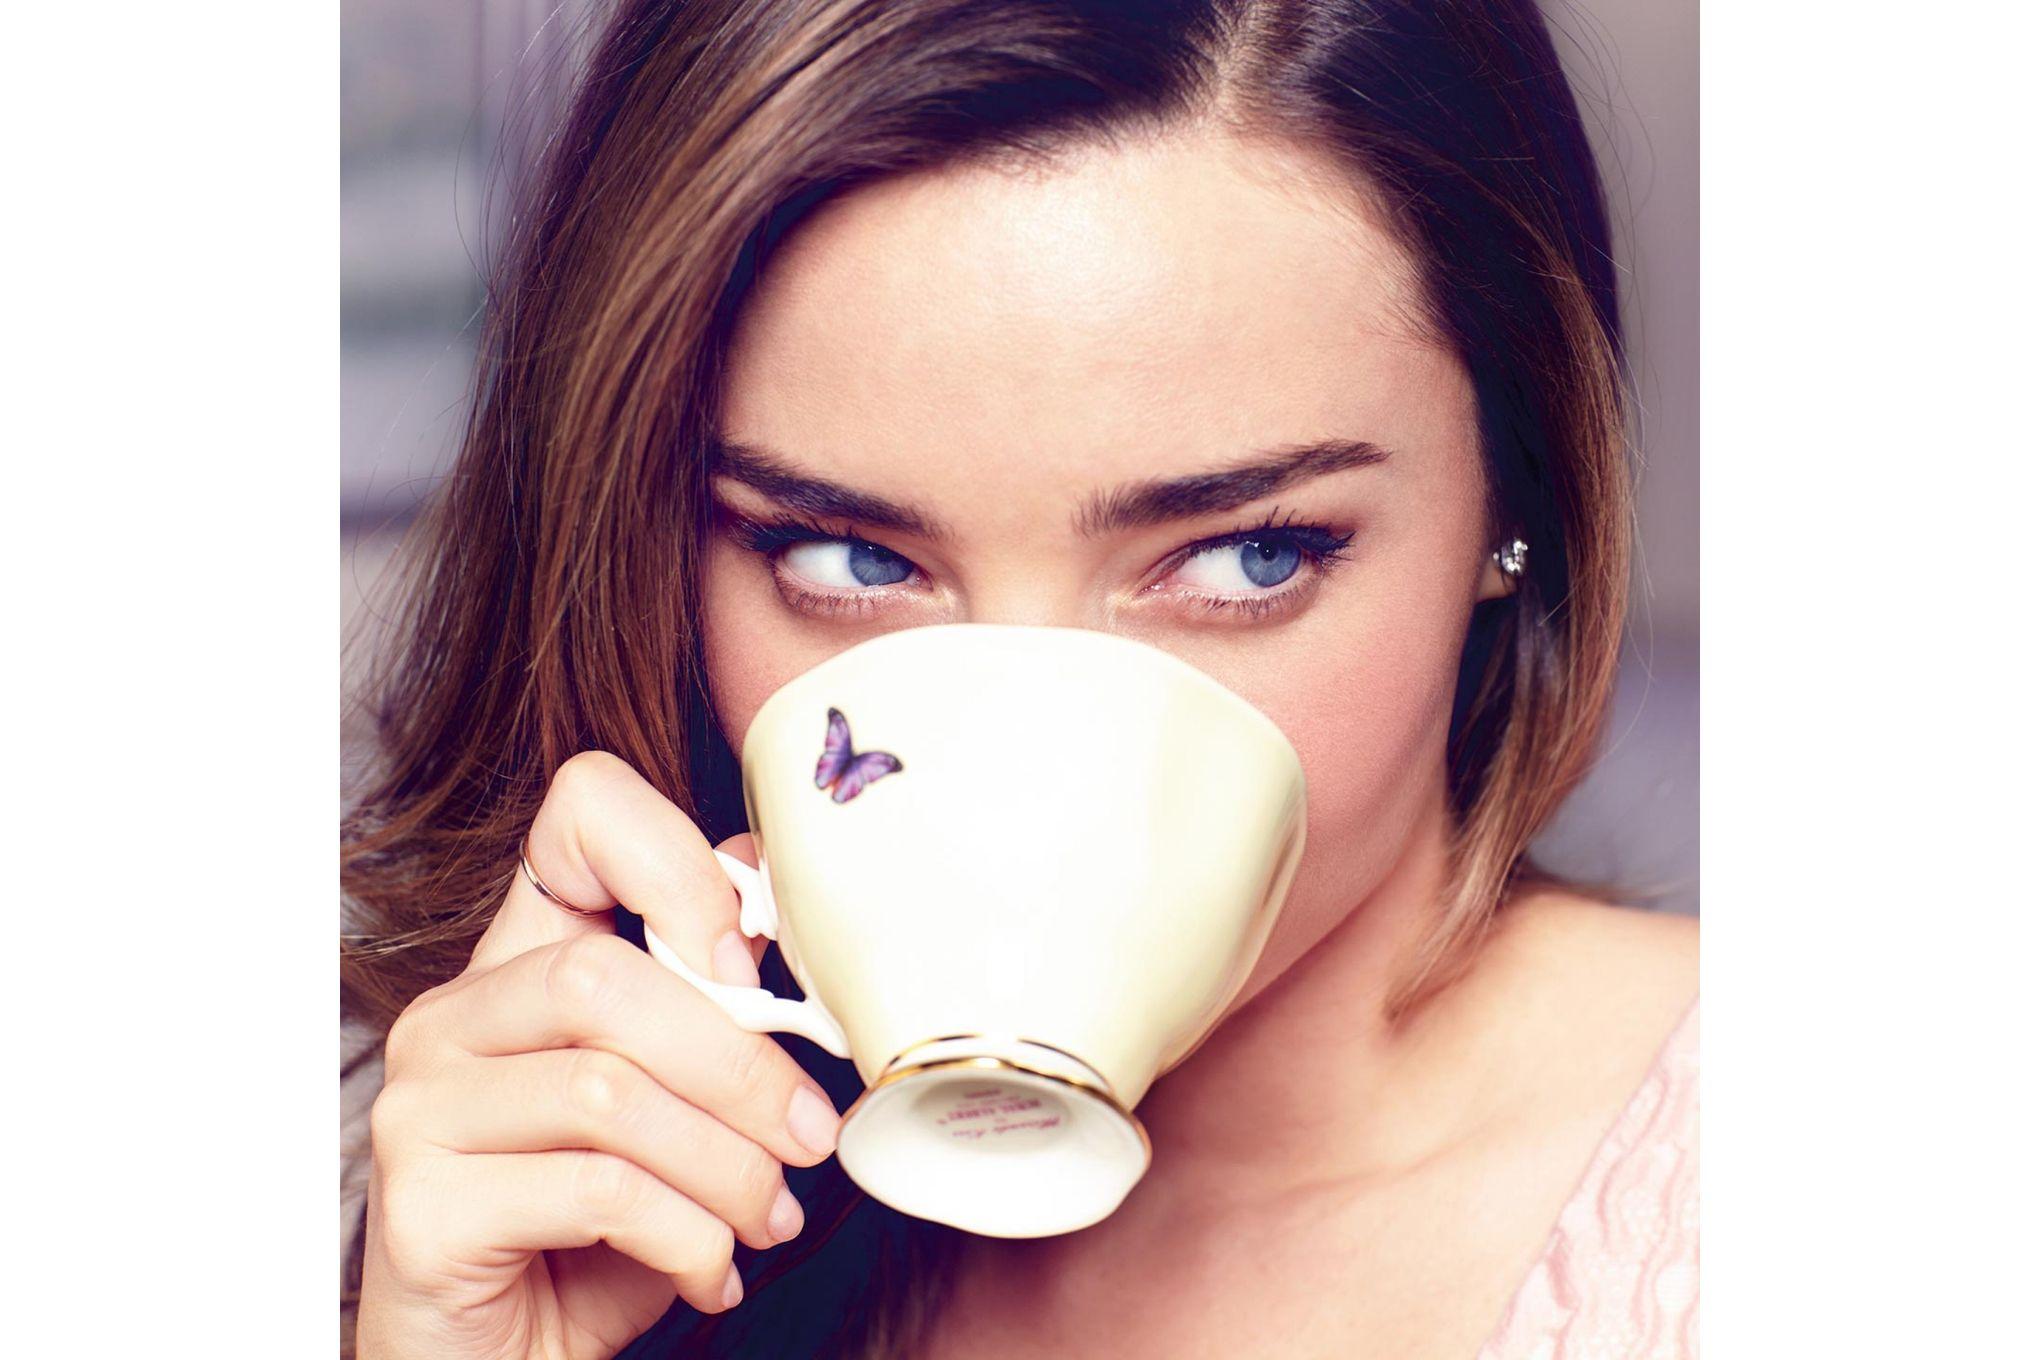 Miranda Kerr for Royal Albert Joy 3 Piece Set Teacup, Saucer, Plate 20cm Joy thumb 4